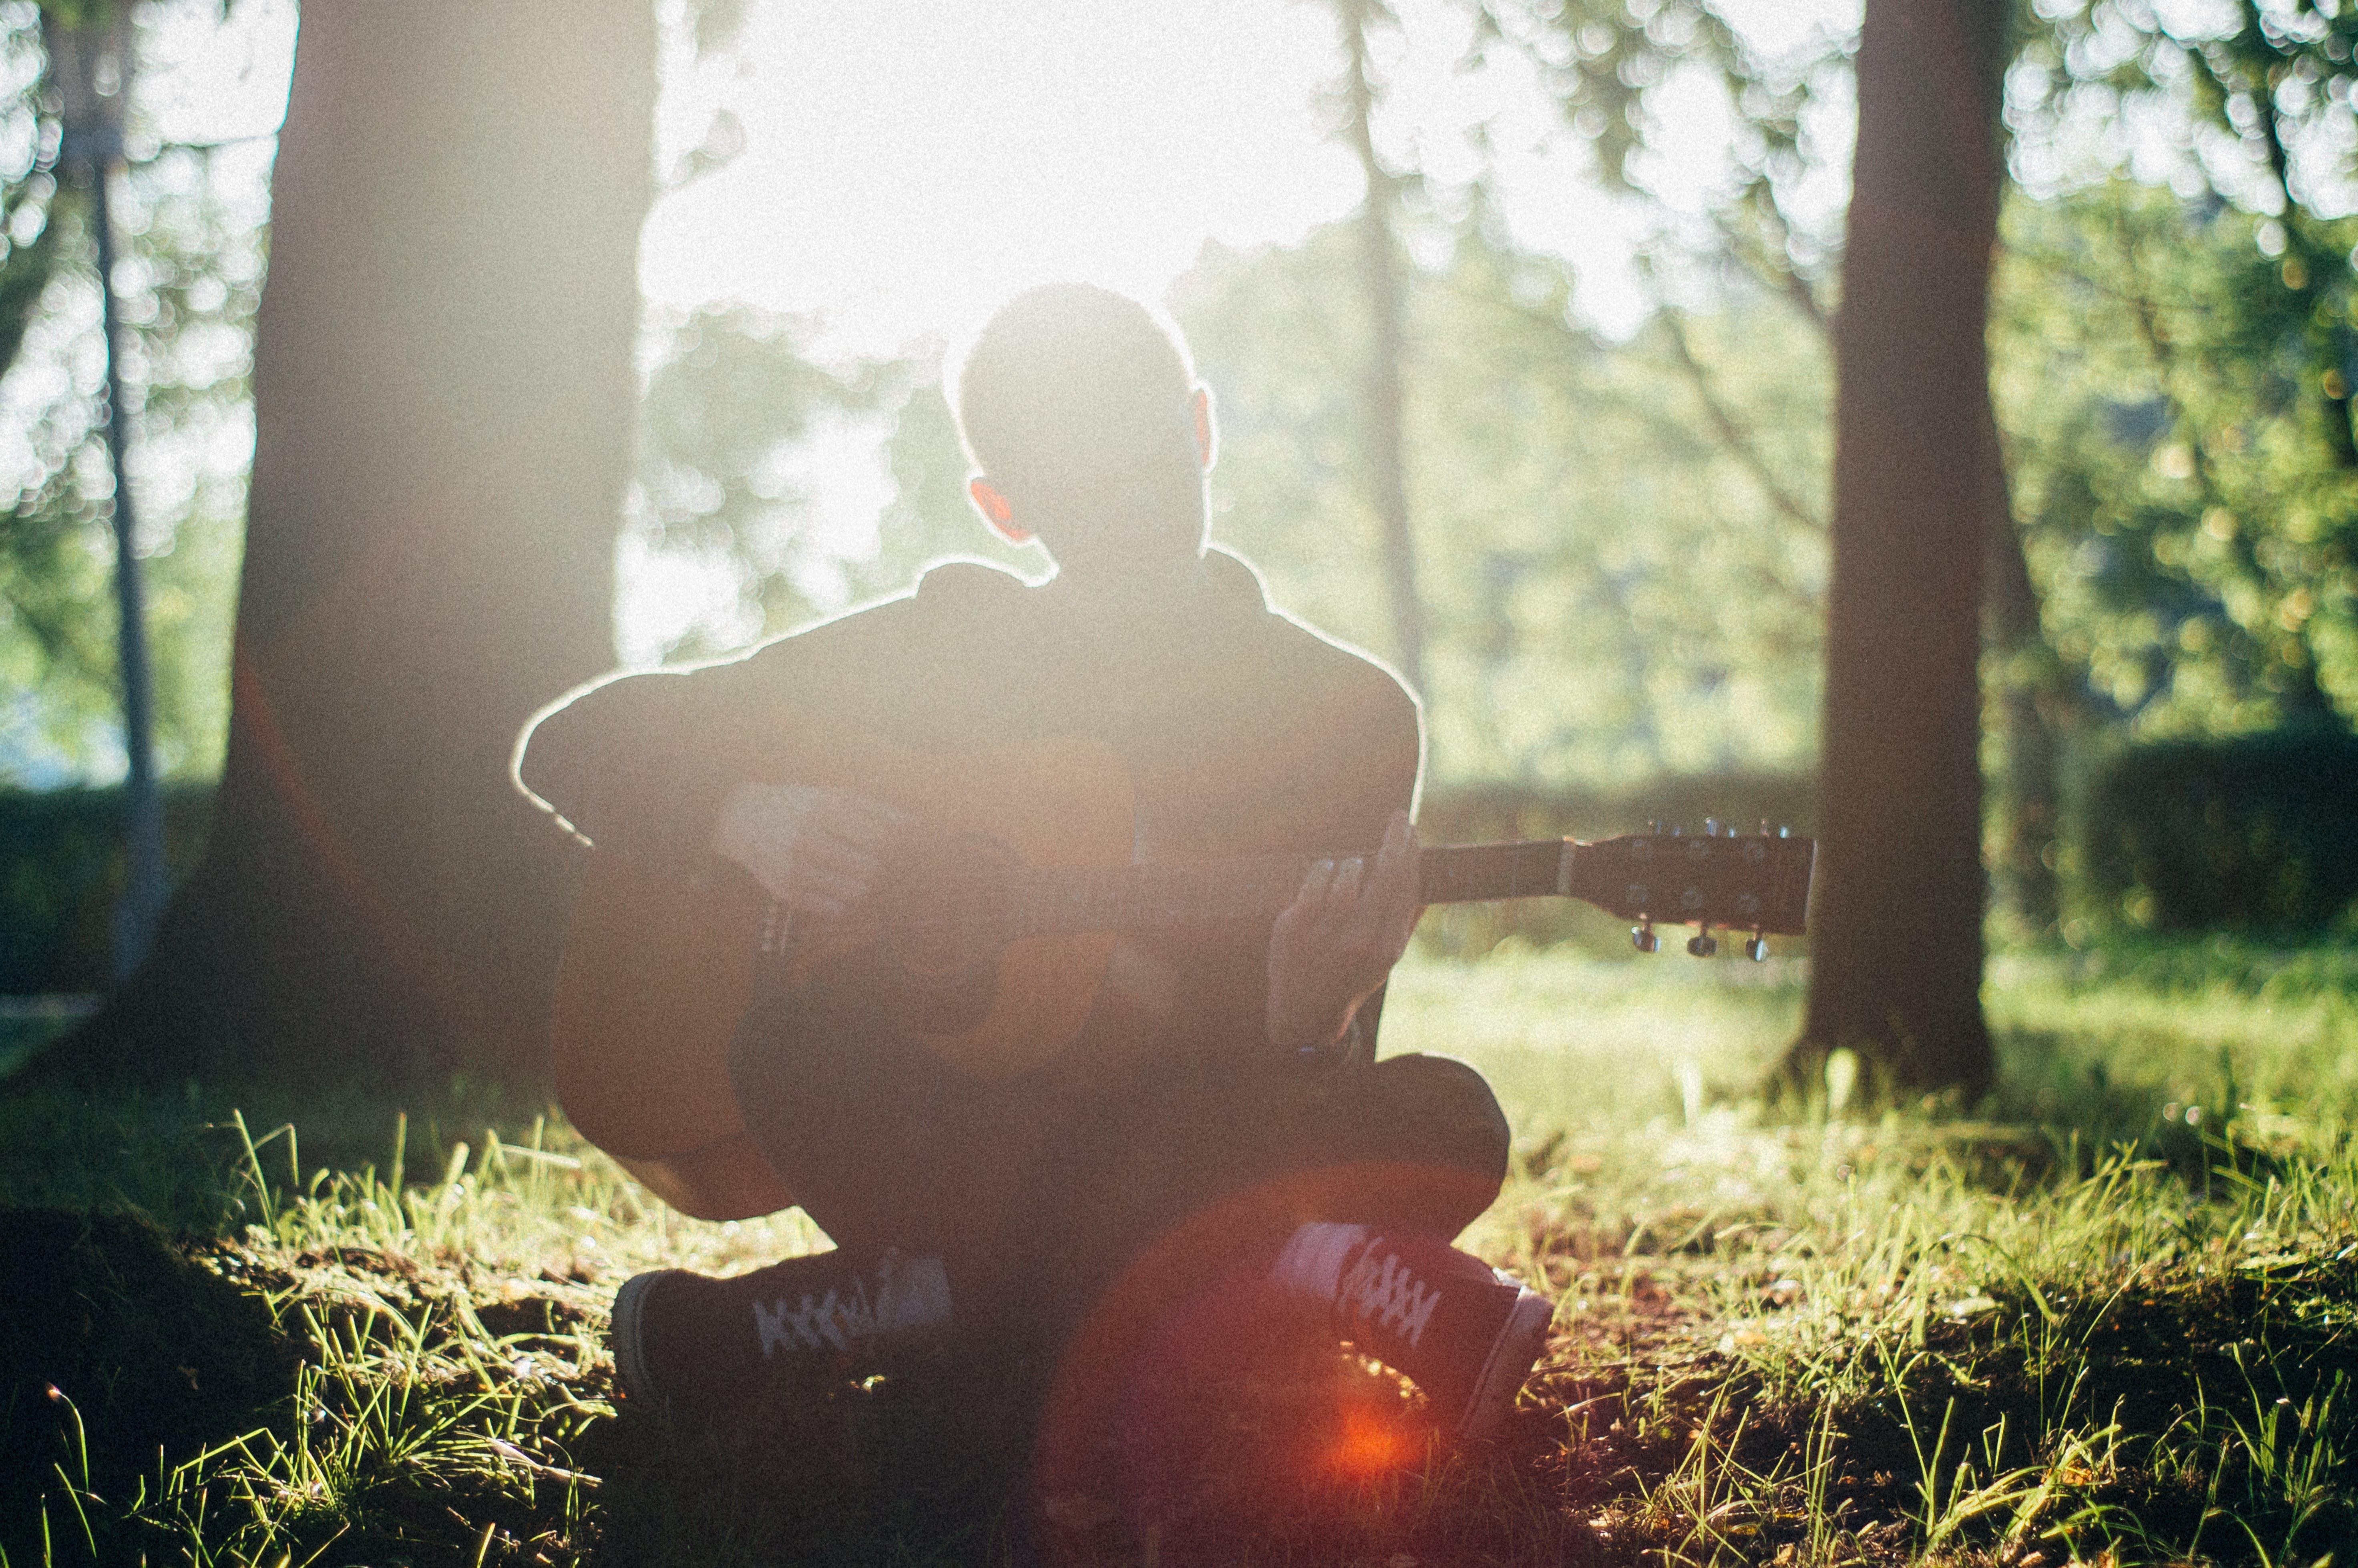 Kostenloses Stock Foto zu akustische gitarre, bokeh, draußen, fokus